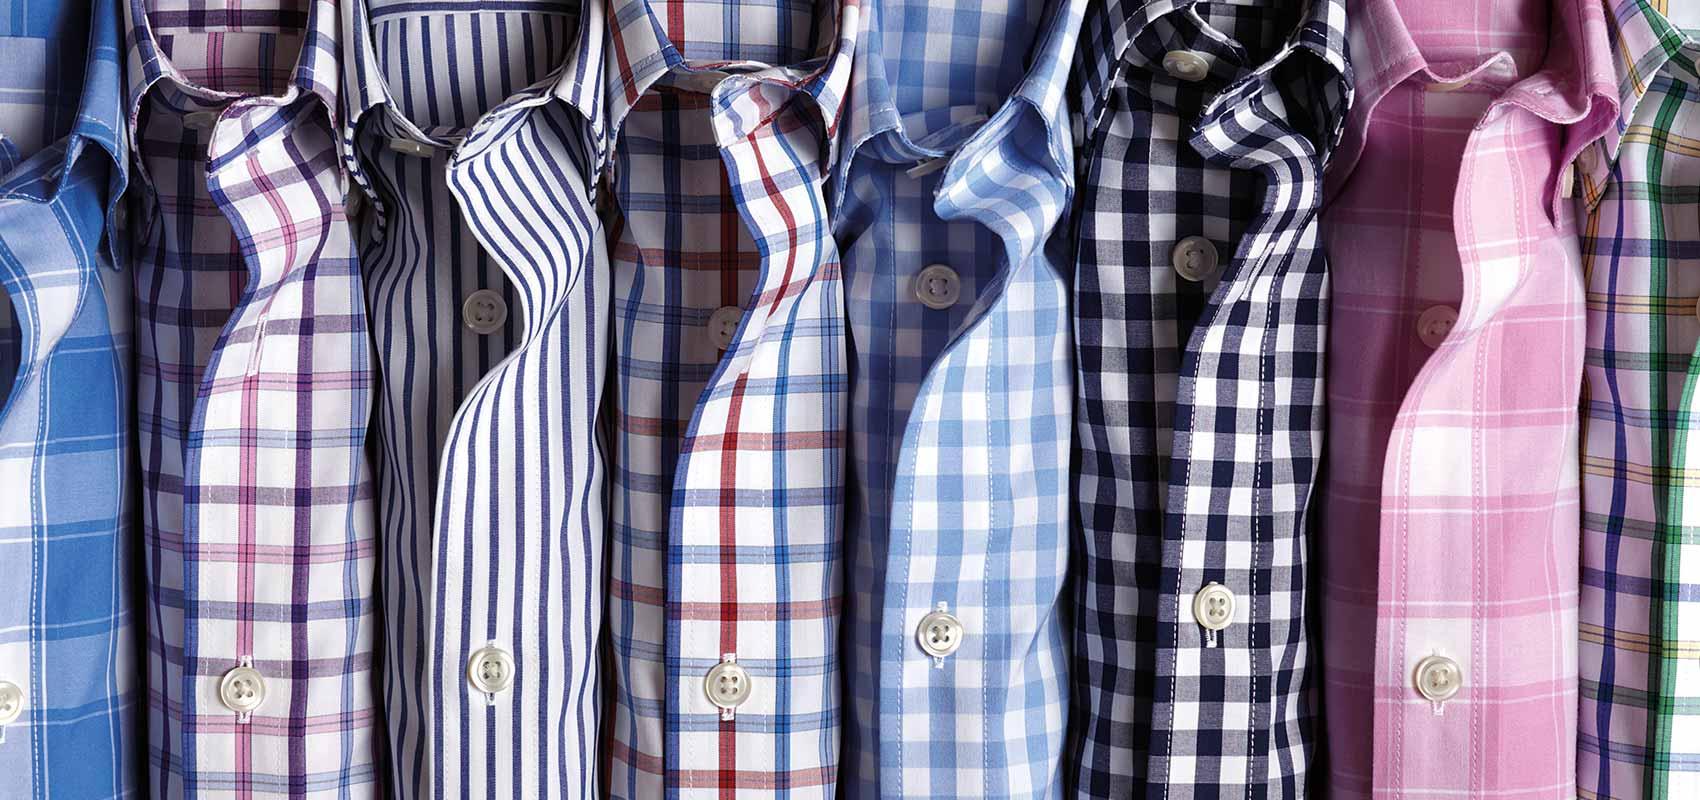 Charles Tyrwhitt casual shirts